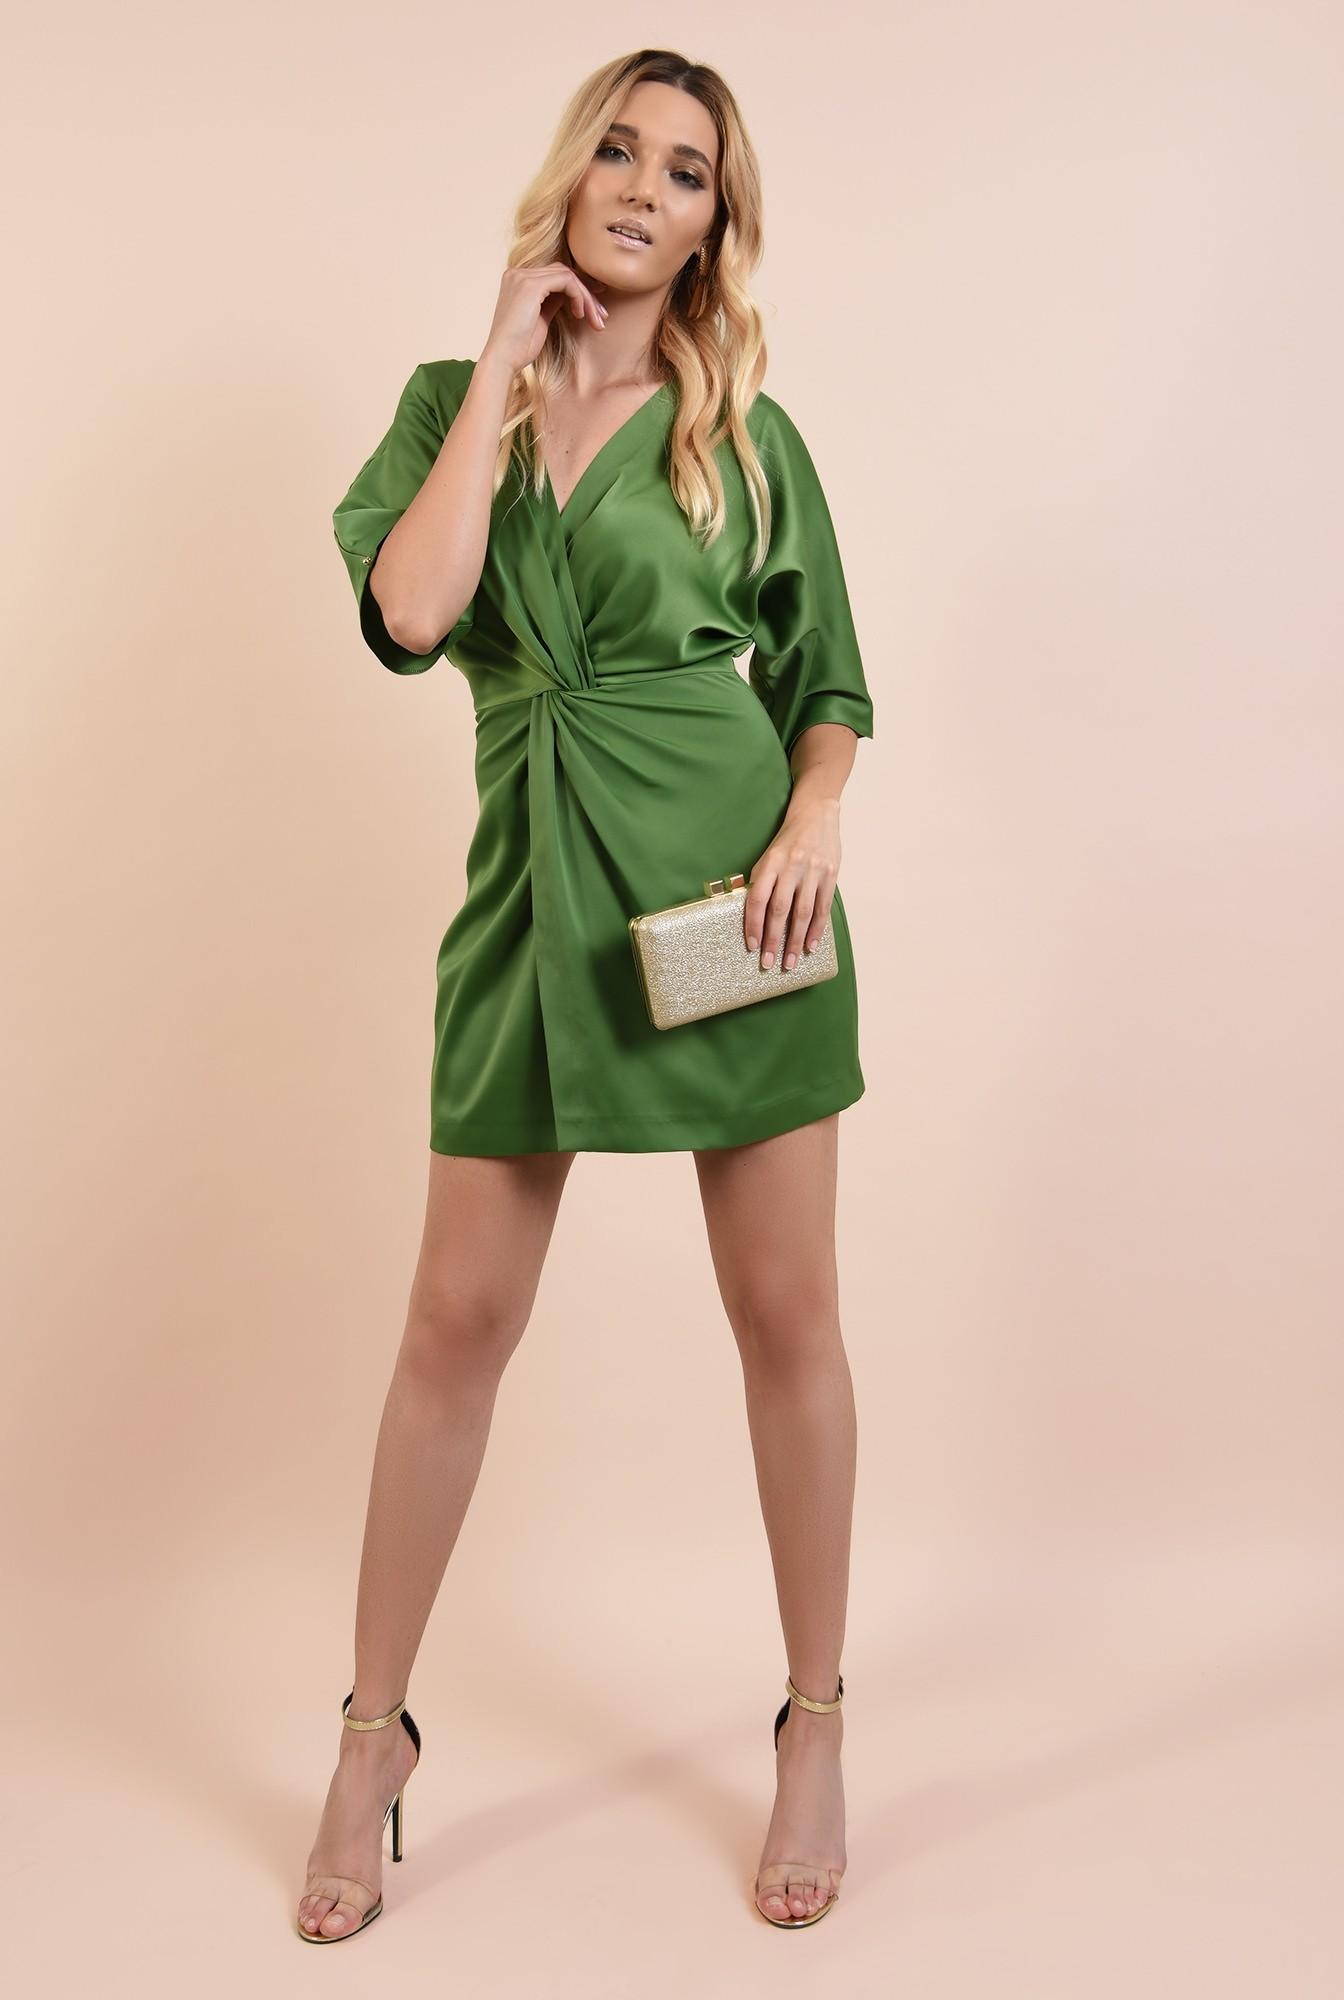 3 - rochie eleganta, verde, din satin, anchior petrecut, talie drapata